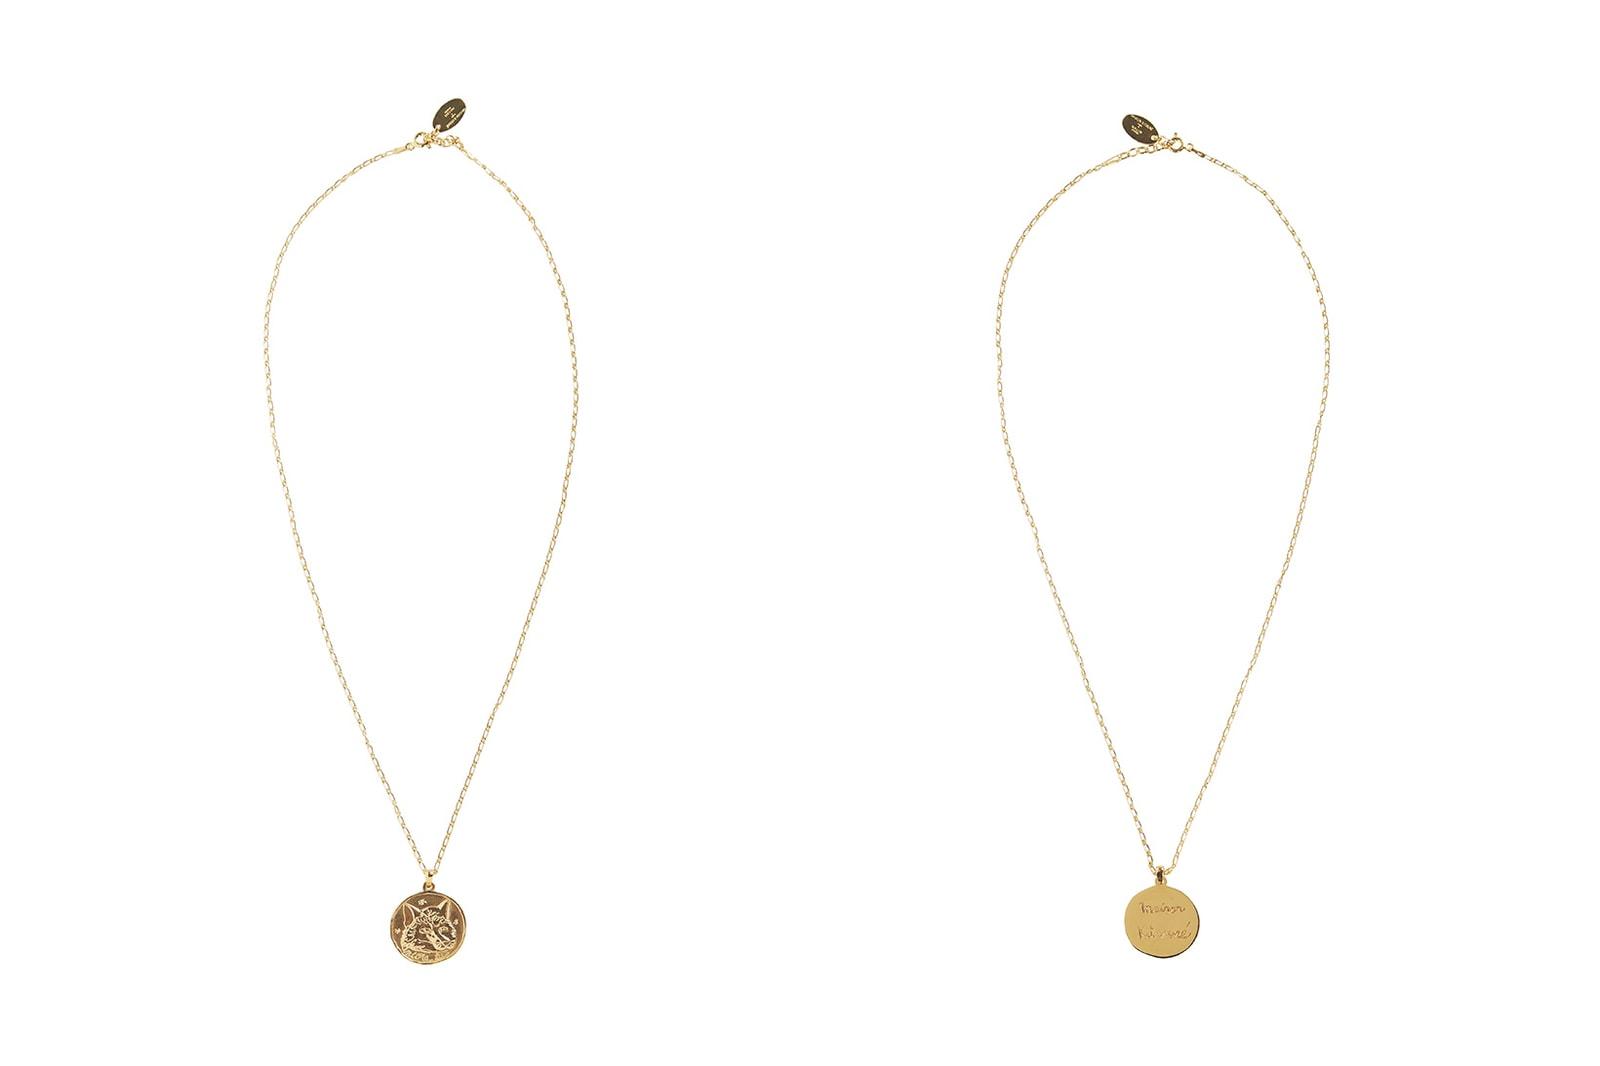 nalin studios maison kitsune jewelry collab unisex yuni ahn